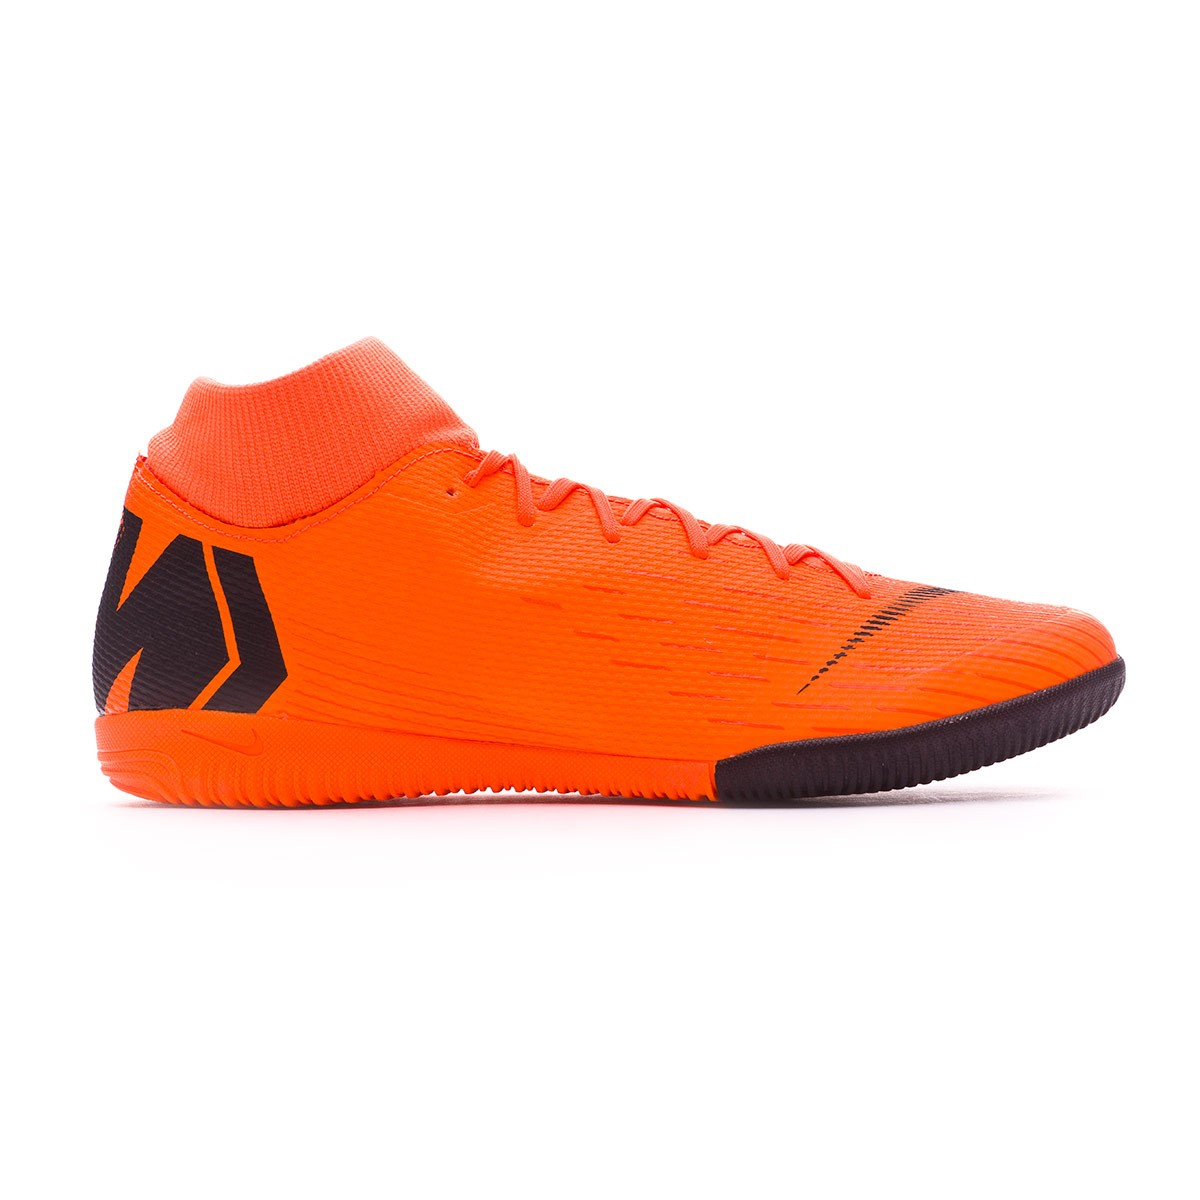 d0459df3625e Futsal Boot Nike Mercurial SuperflyX VI Academy IC Total orange-Black-Volt  - Football store Fútbol Emotion